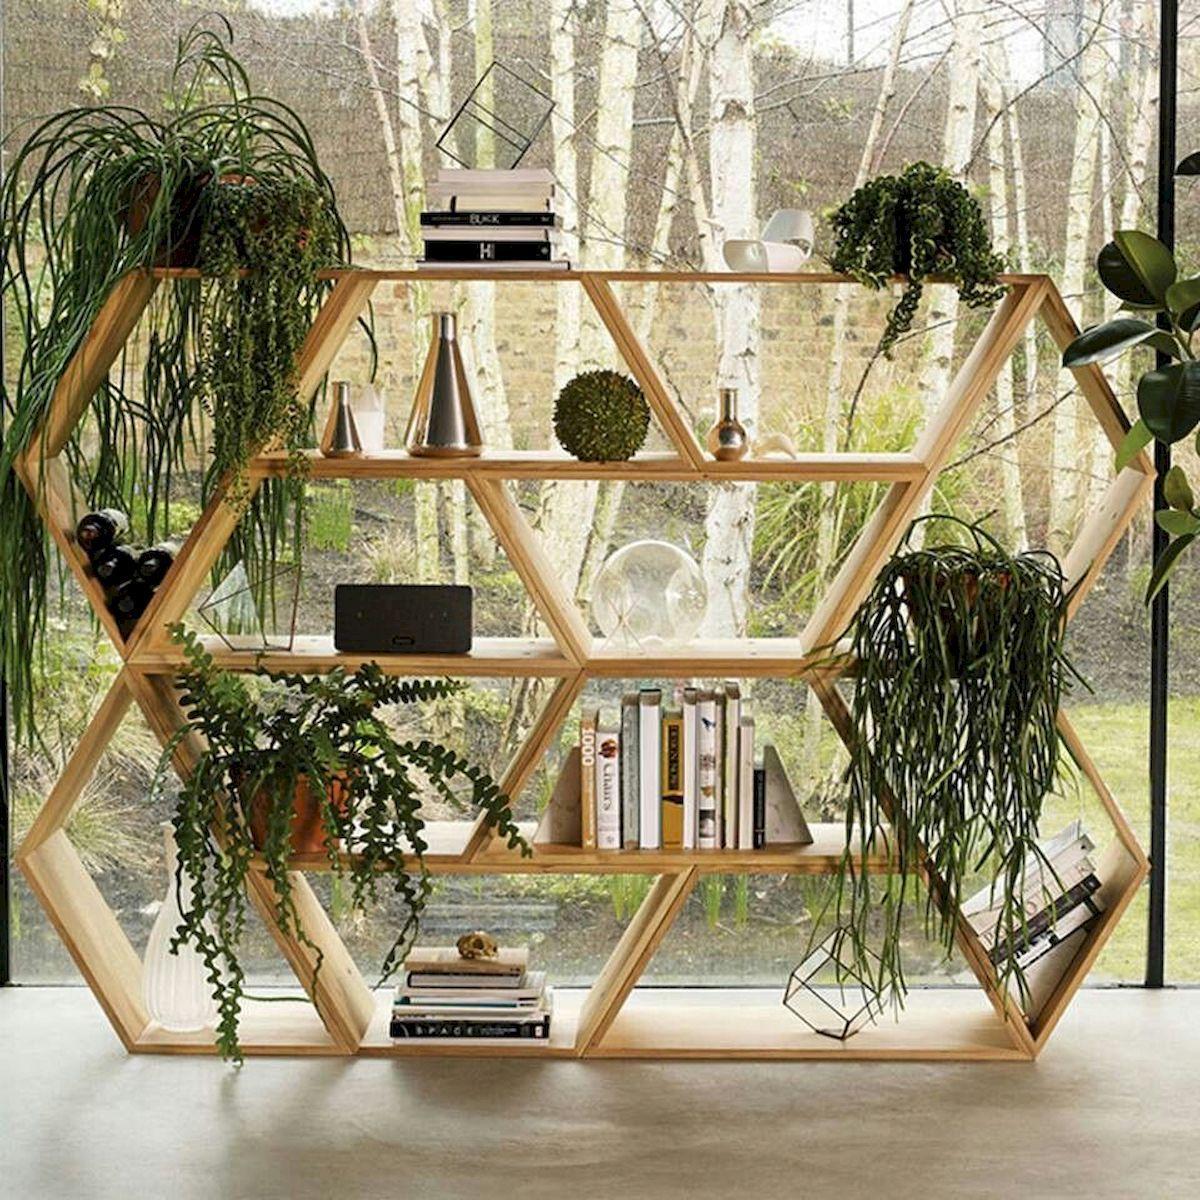 Room Dividers Creative Ideas Unique Bookshelves Fabric Room Dividers Glass Room Divider